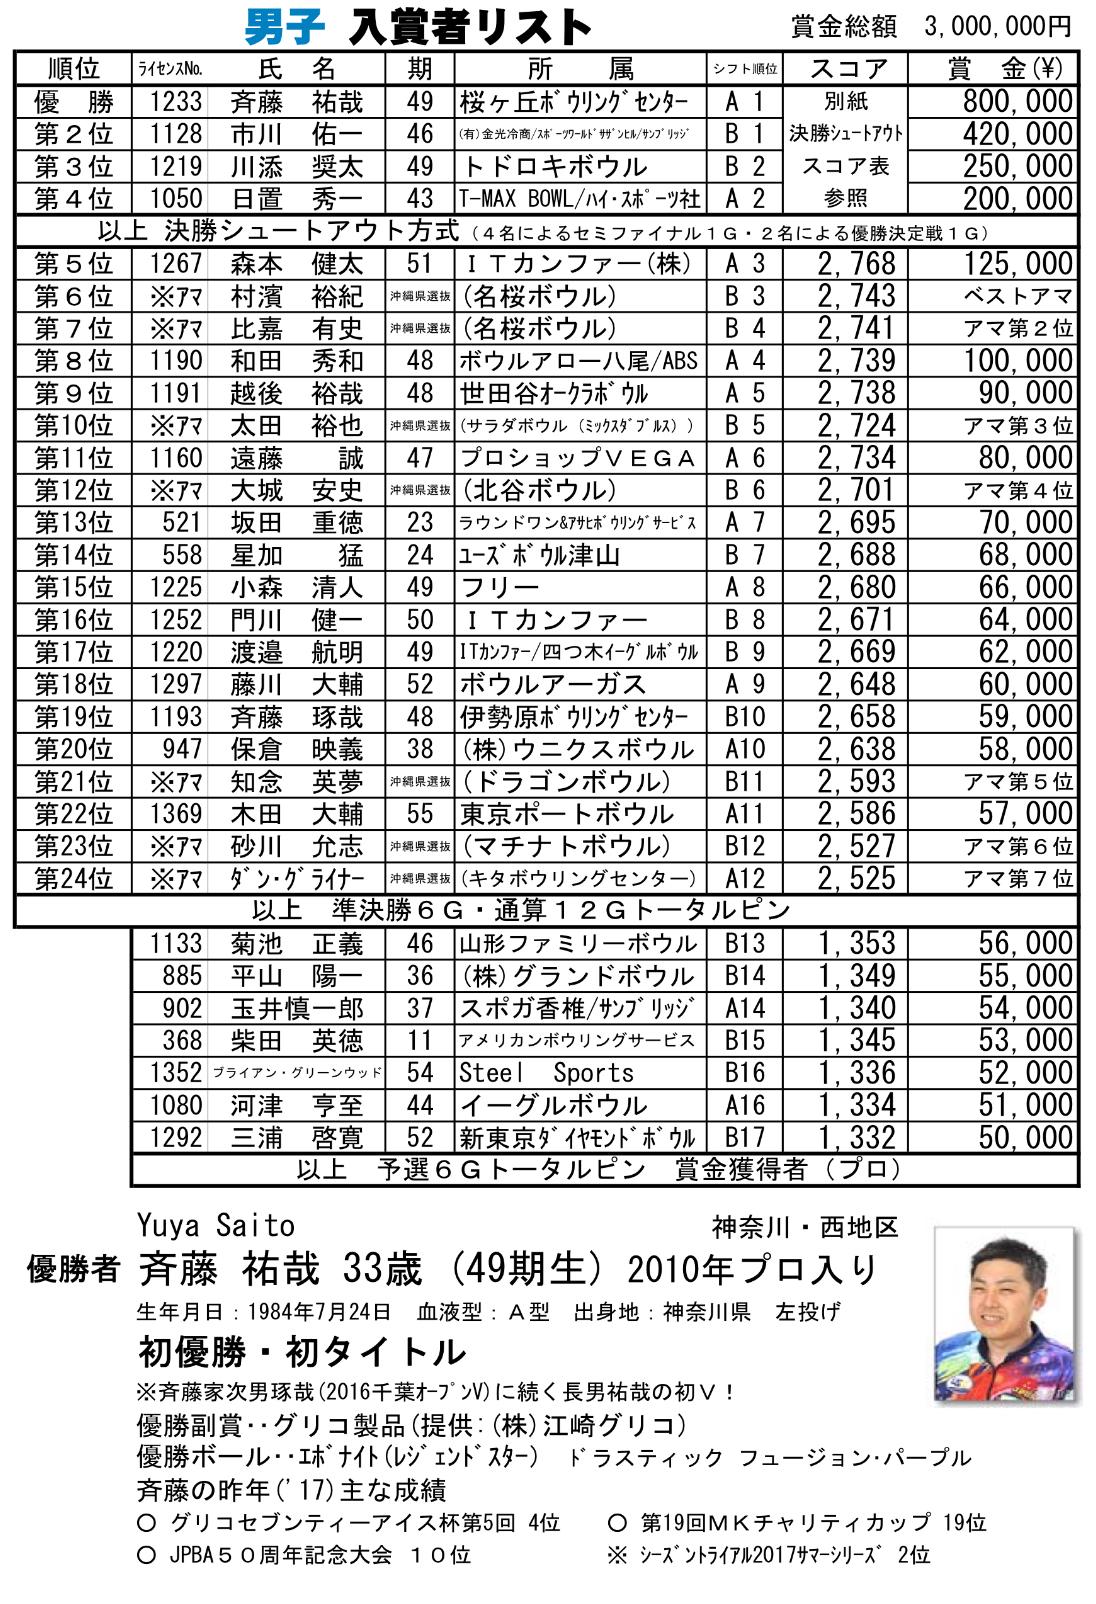 7E1B7FEE-519F-483A-870C-F6F240872106.jpeg